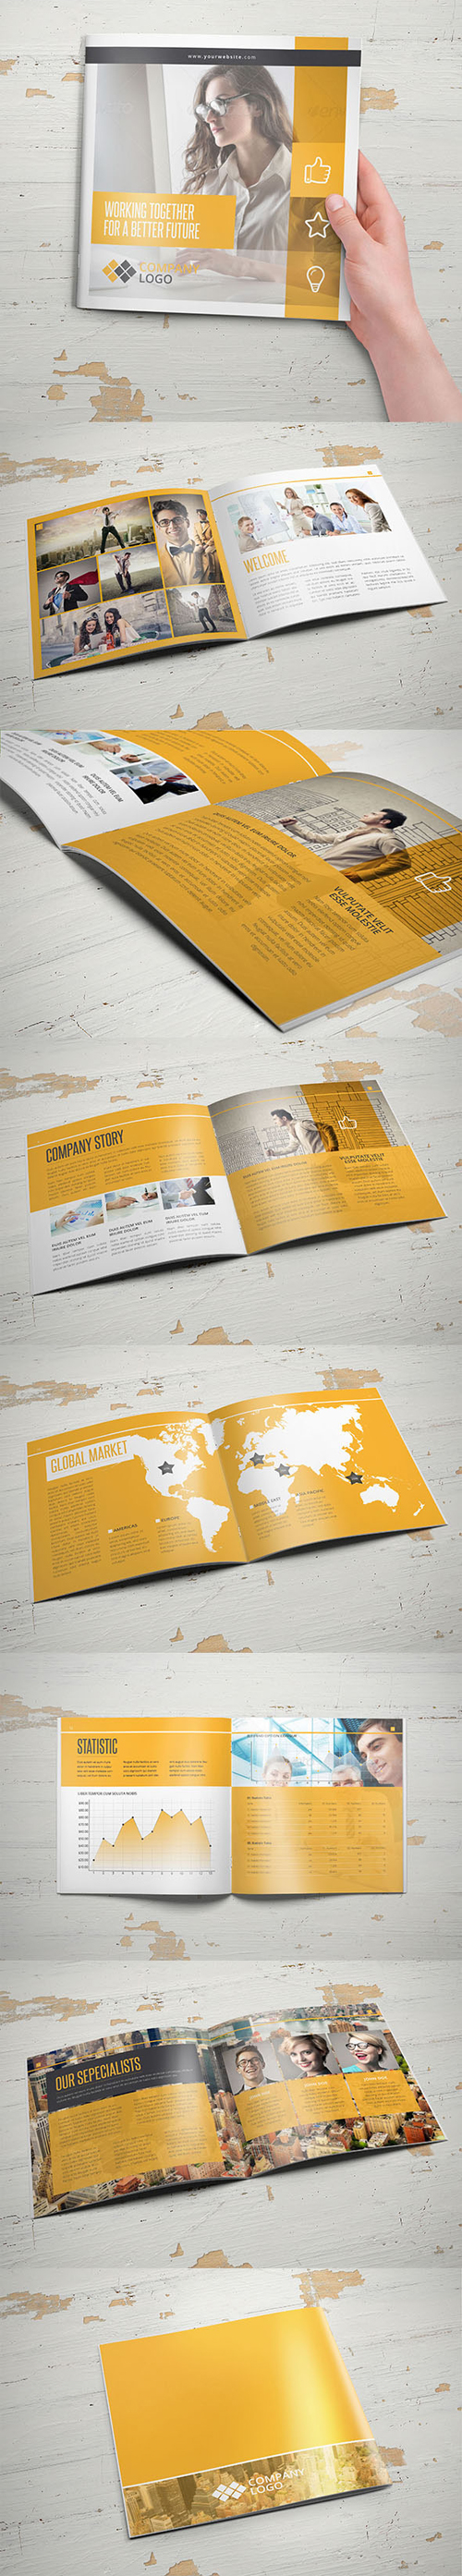 Multipurpose Business Square Brochure Template